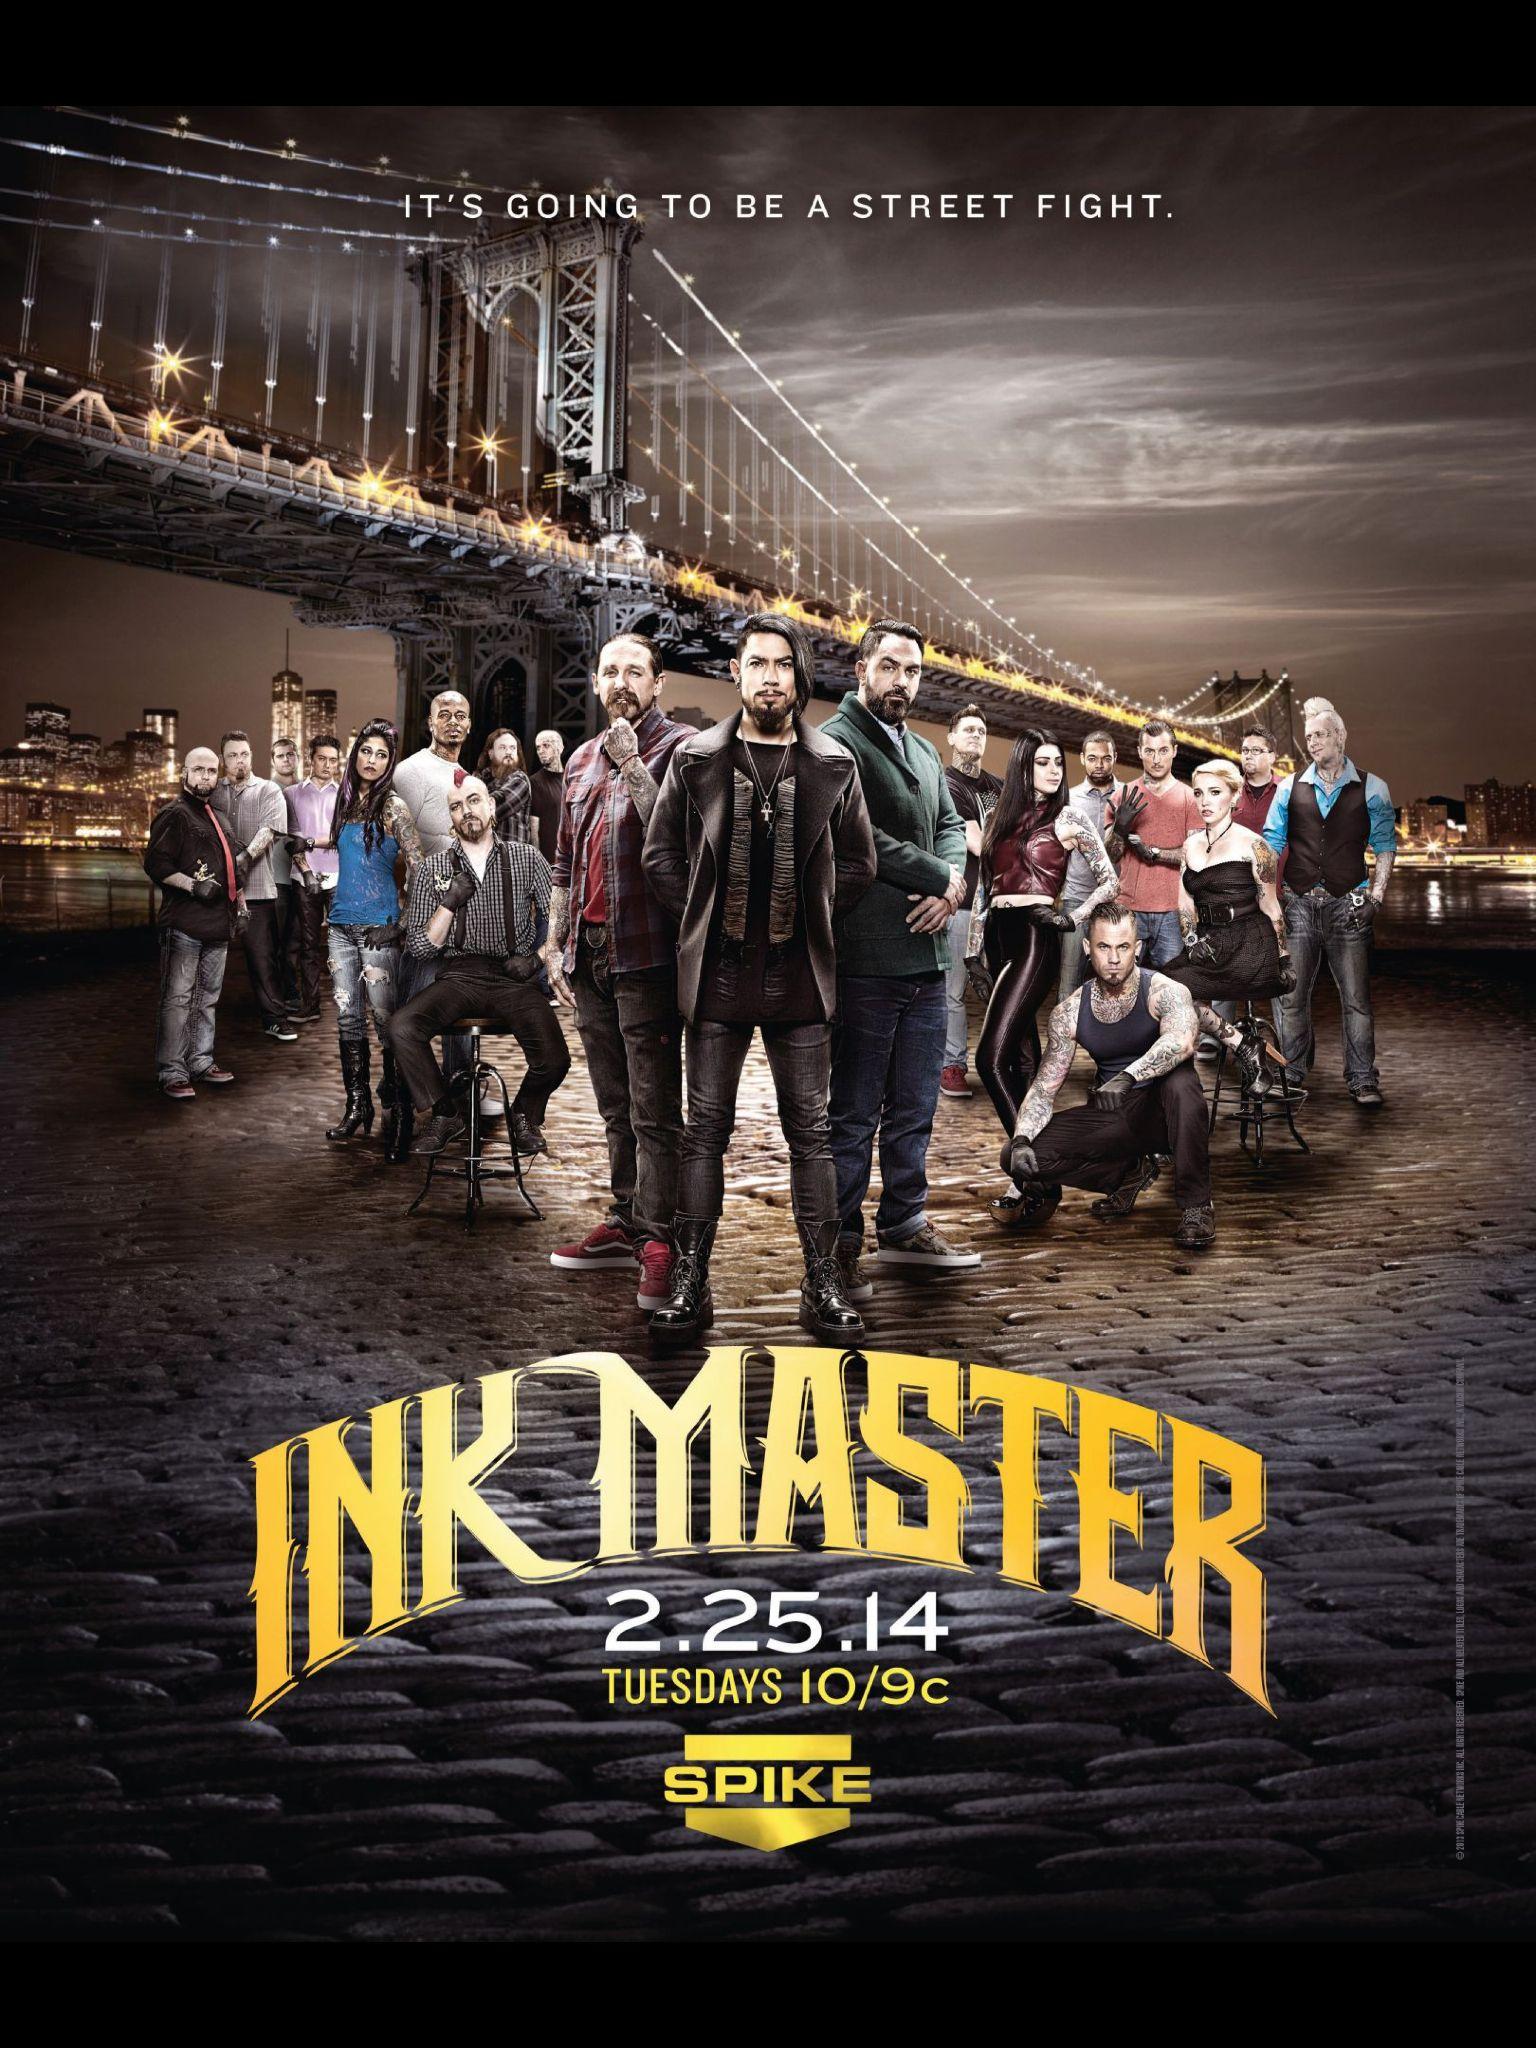 Ink Master Ink master, Street fights, Video on demand